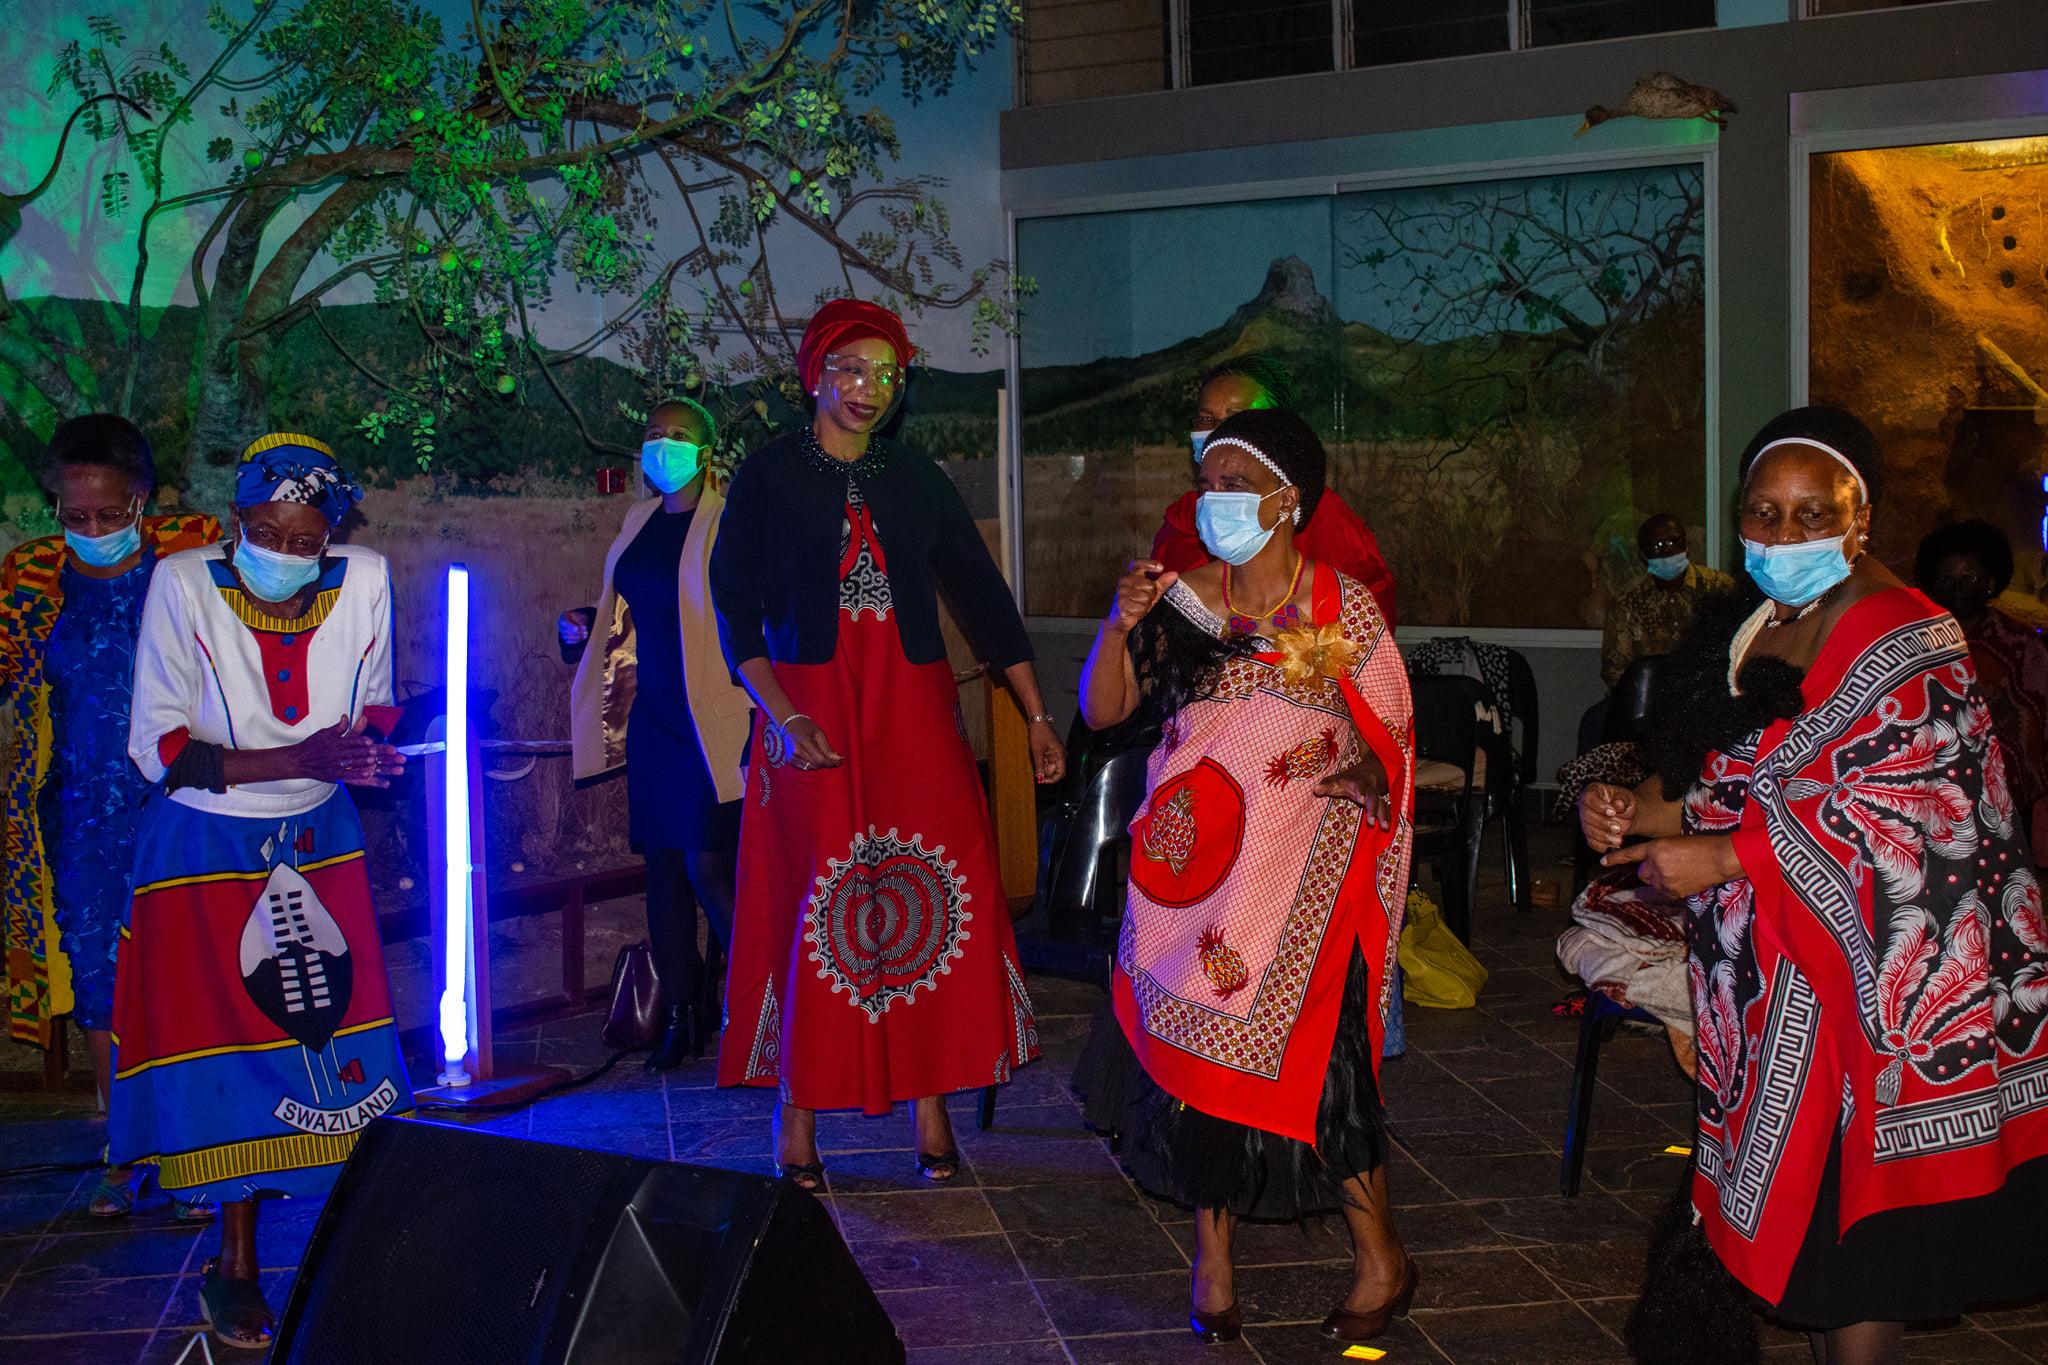 Africa Day celebration in Eswatini